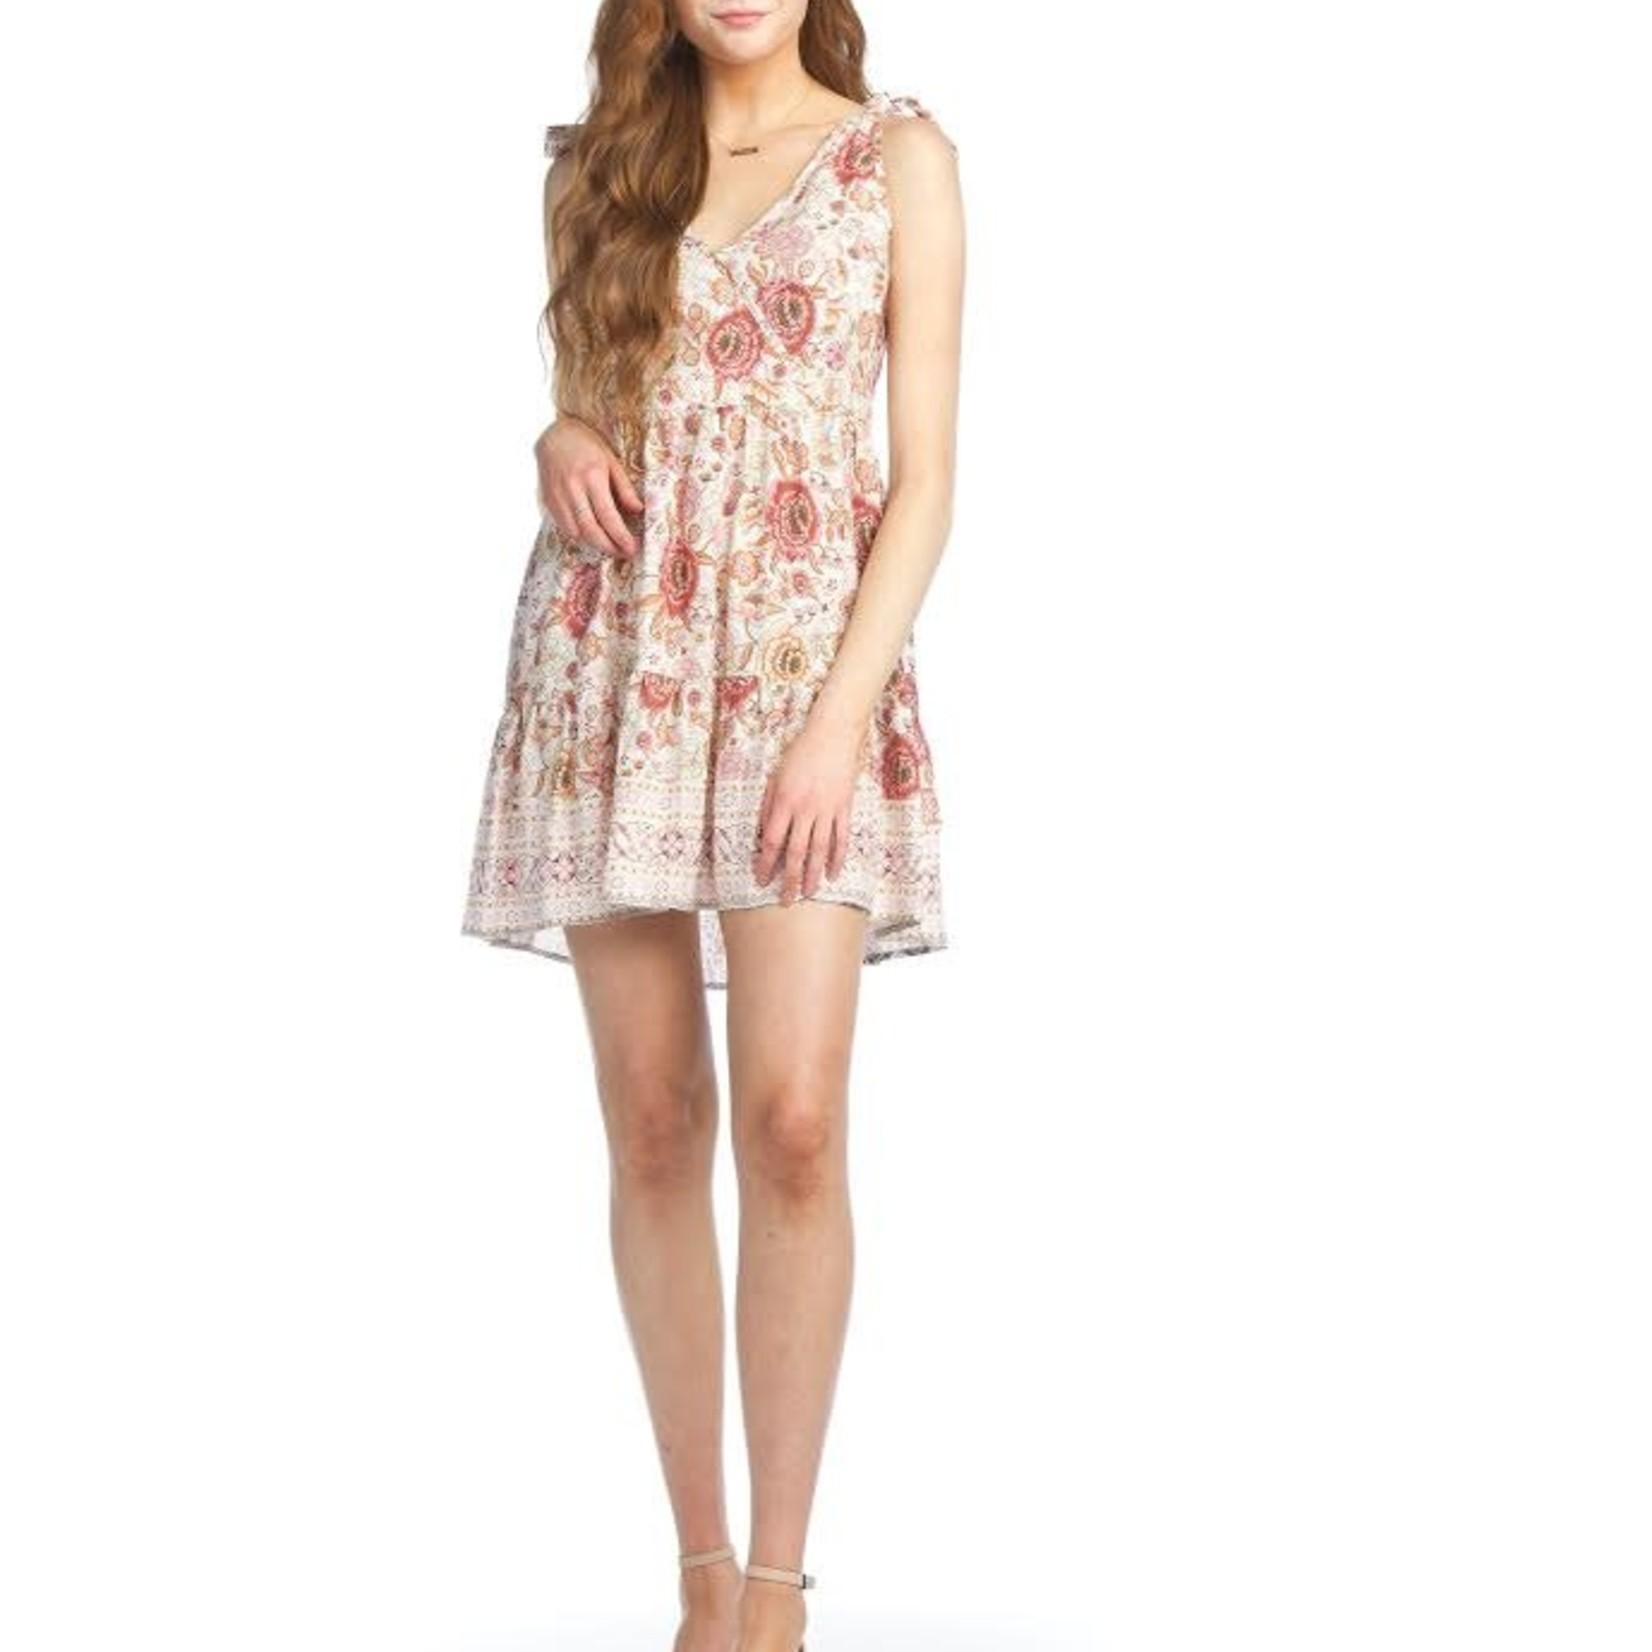 Papillon Floral Dress With Adjustable Straps 07583